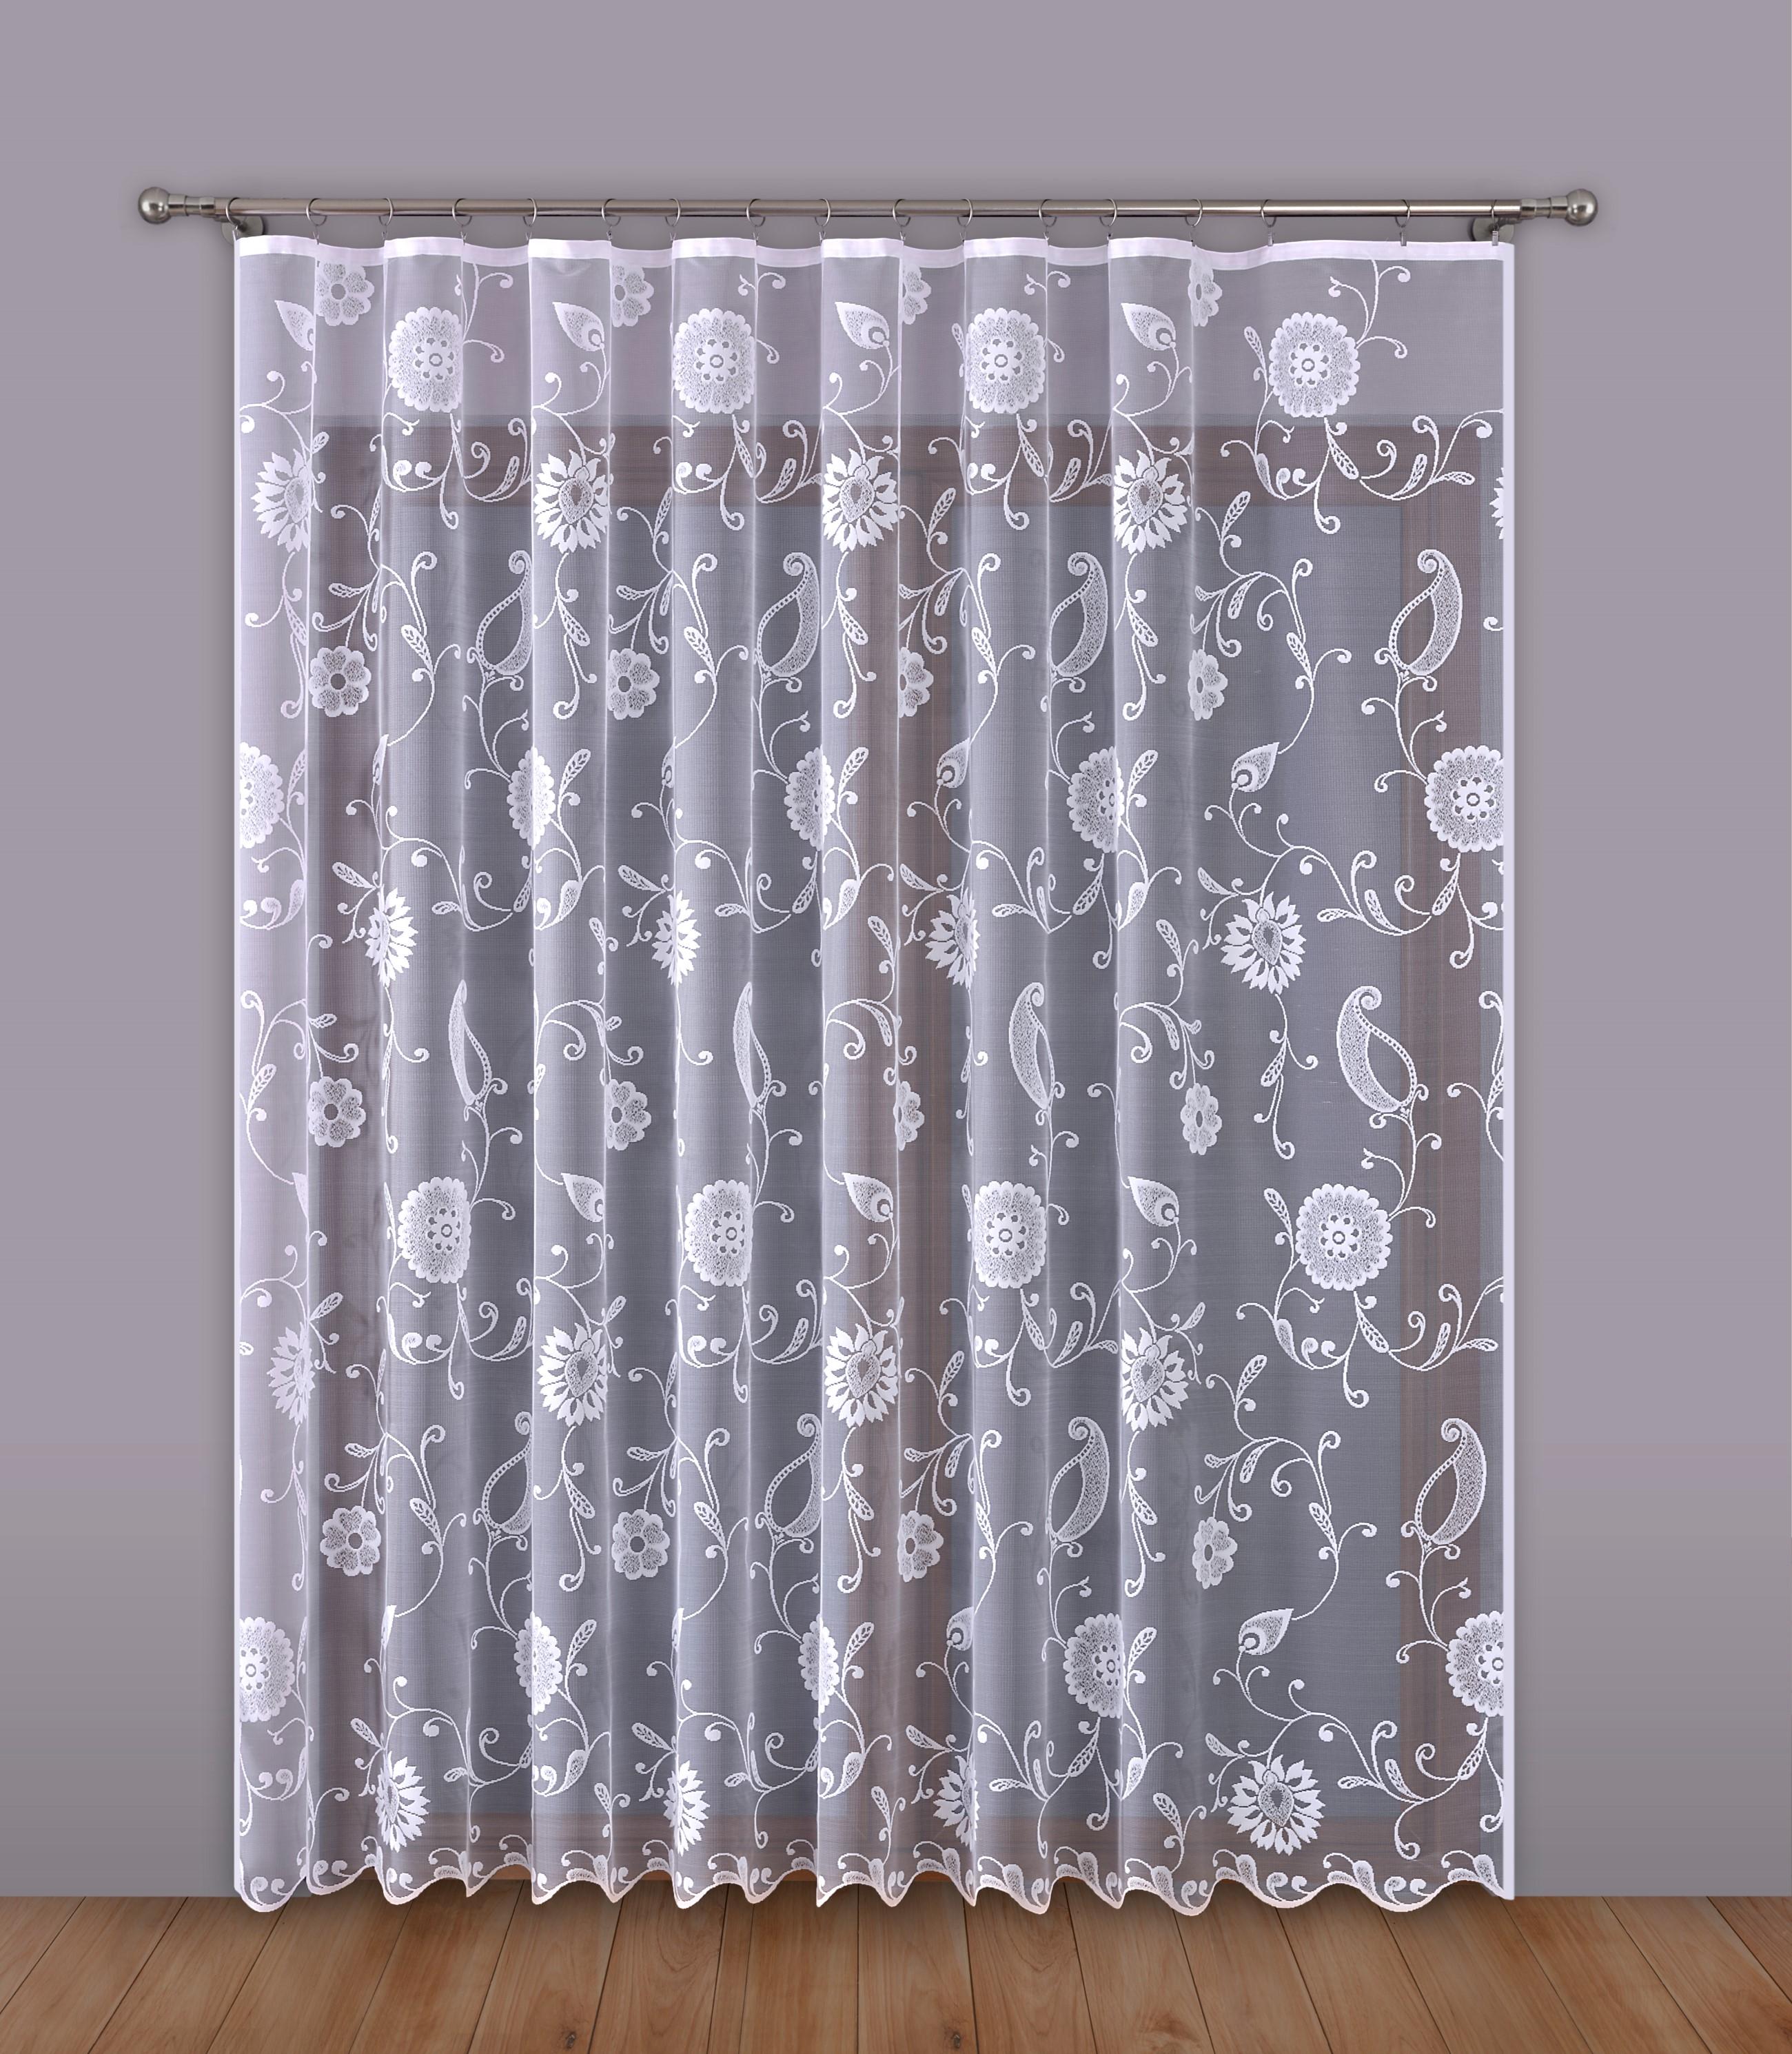 Шторы Primavera Классические шторы Gerry Цвет: Белый шторы primavera классические шторы maev цвет белый